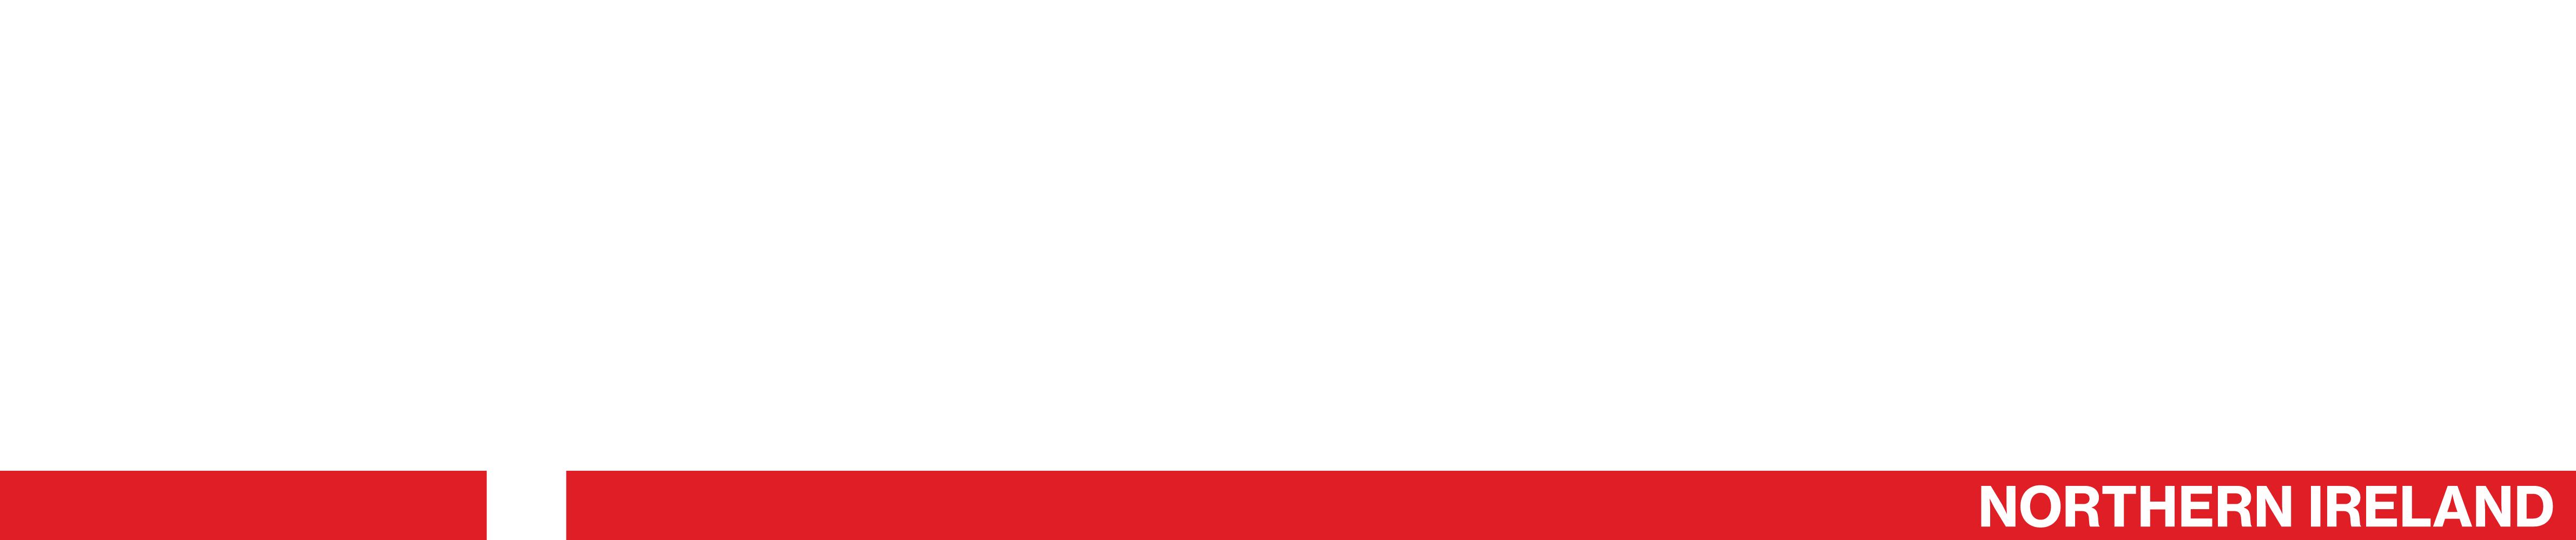 Alpha Fire Protection NI Logo